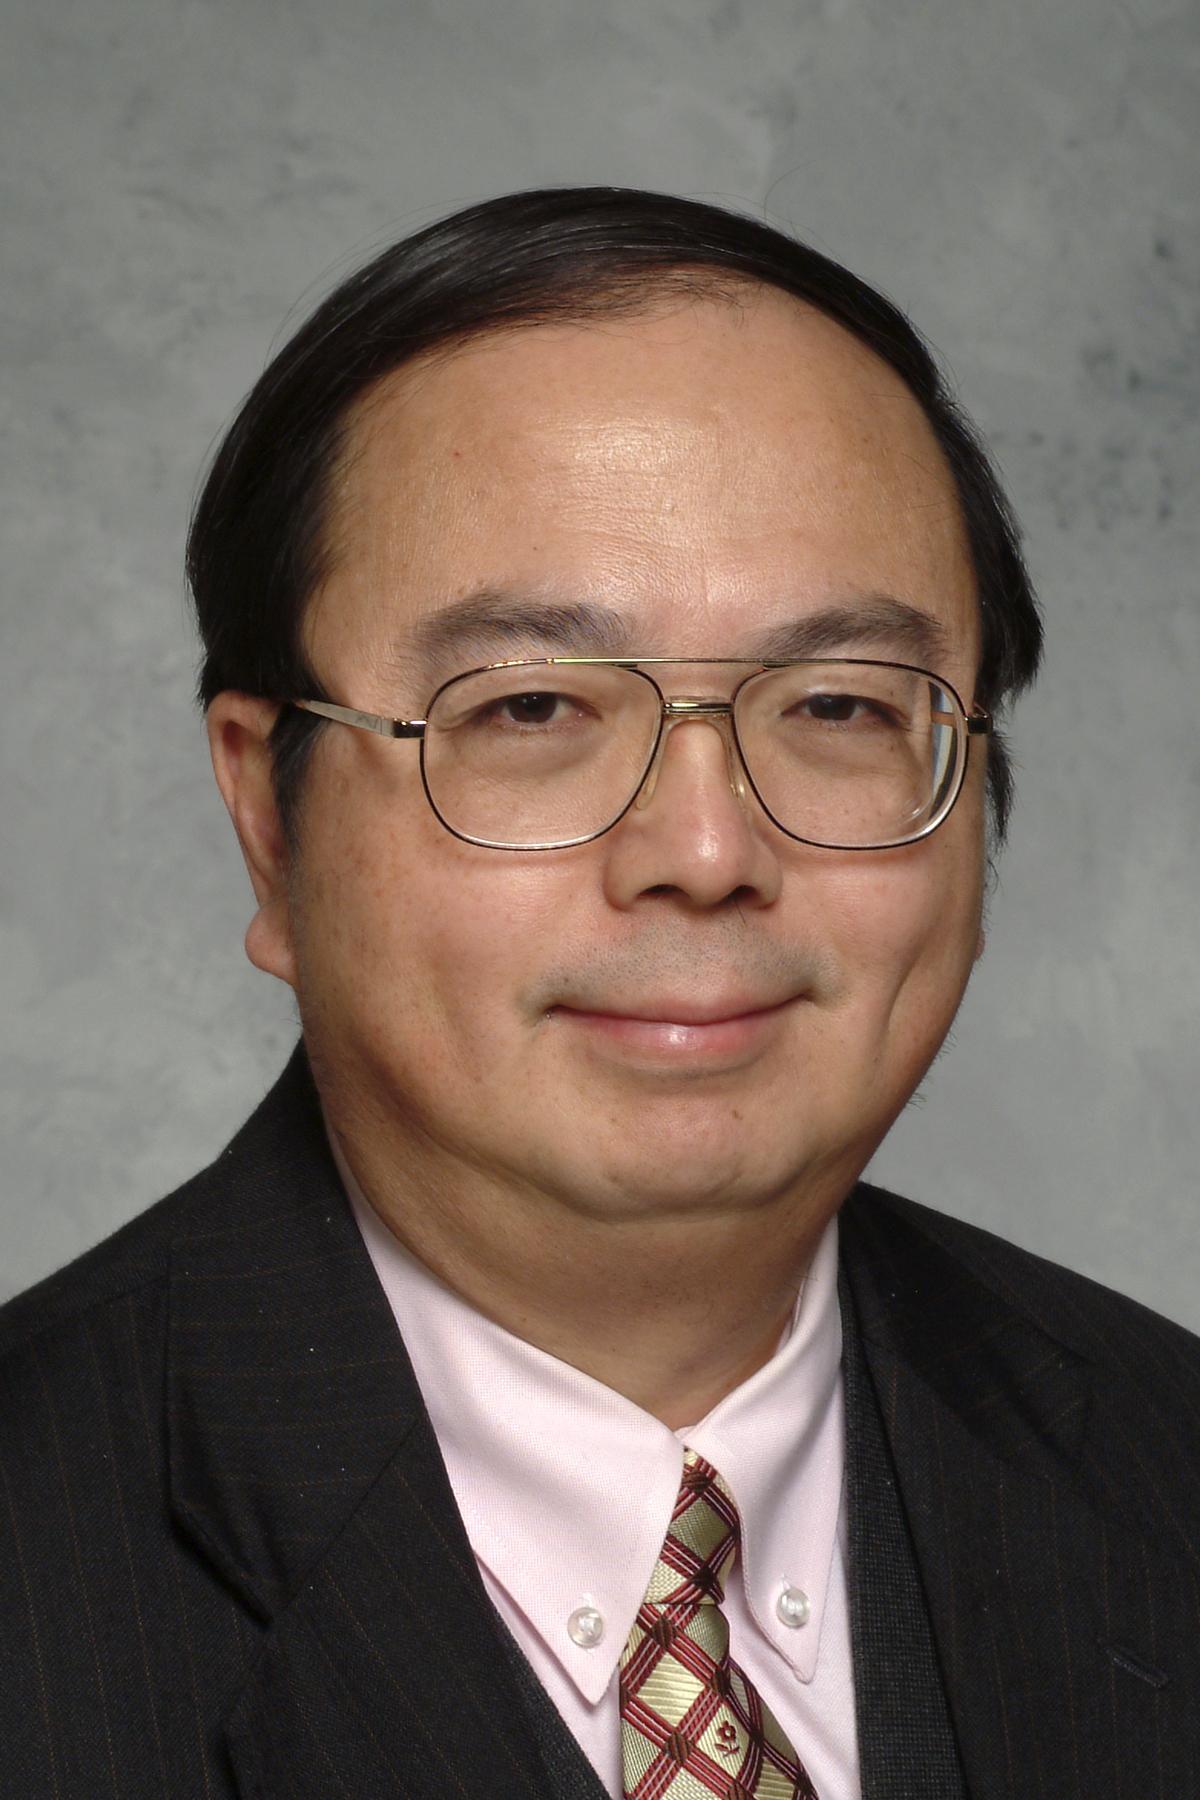 Sae World Congress >> Simon Tung of Vanderbilt Chemicals Wins SAE International Leadership Citation